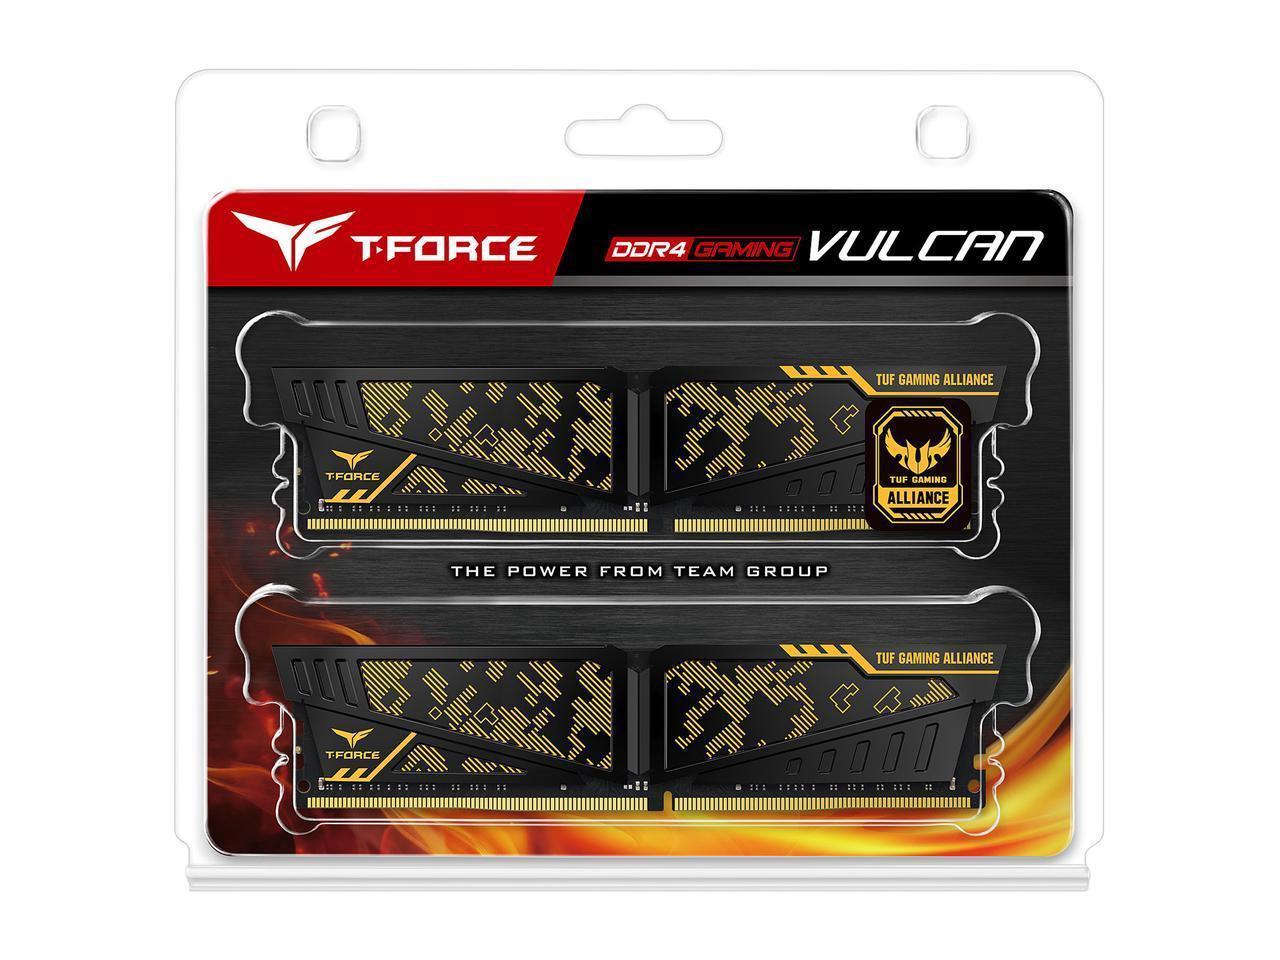 2x8GB Team VULCAN TUF Gaming Alliance 3200MHz DDR4 Gaming RAM image